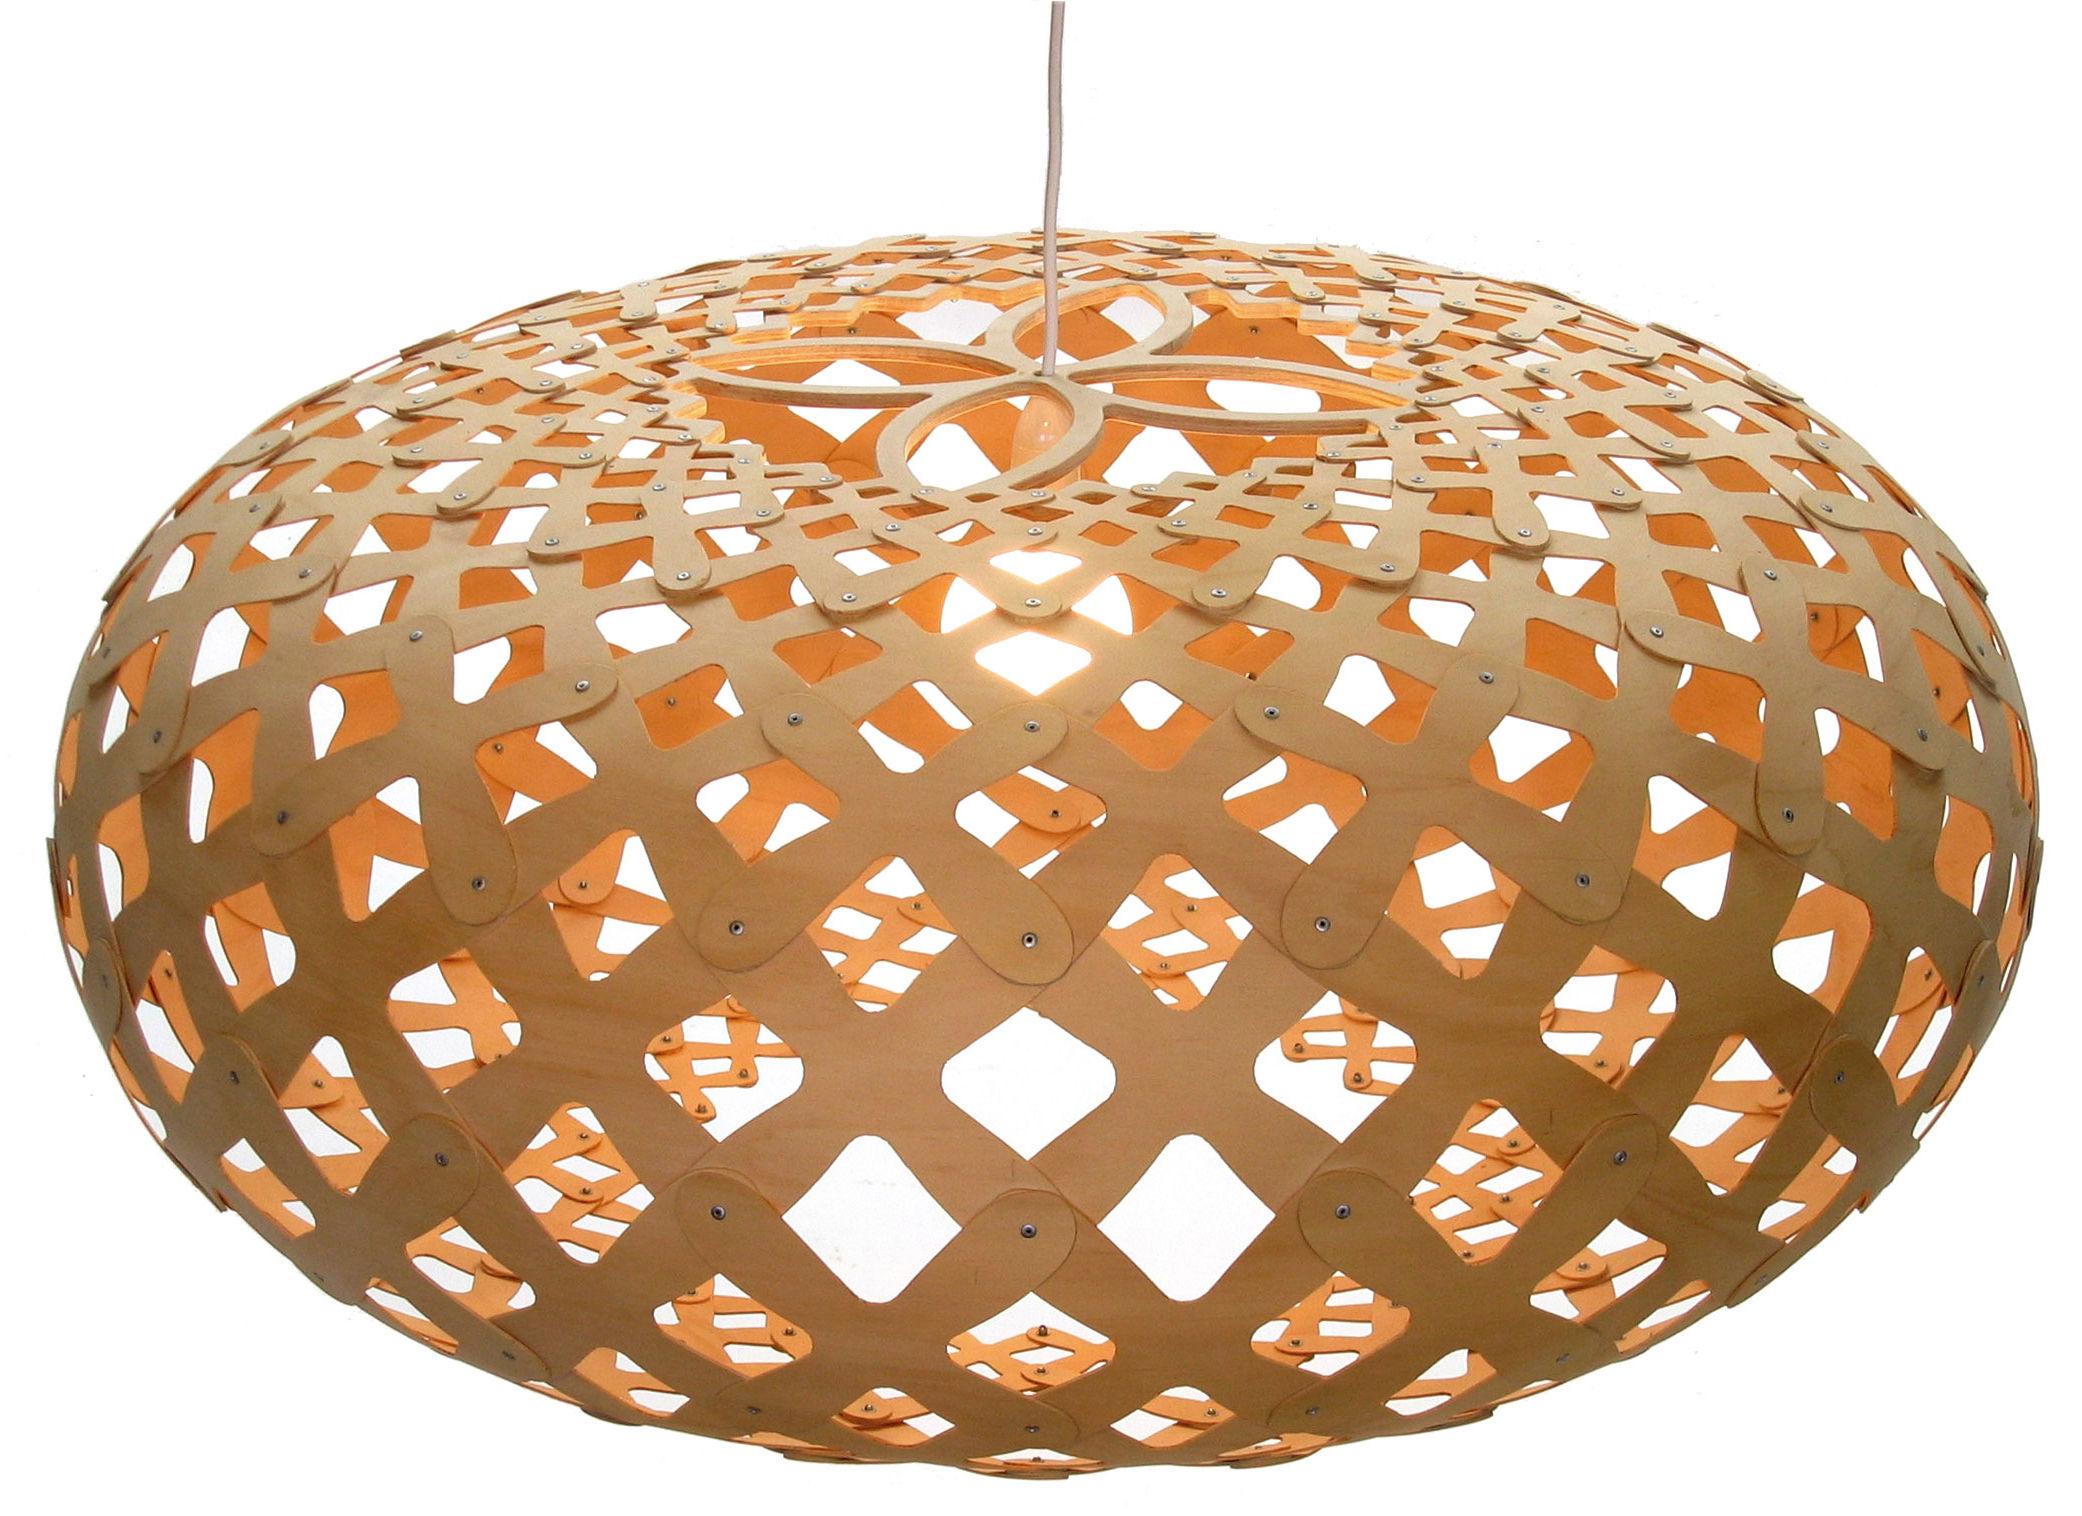 Luminaire - Suspensions - Suspension Kina Ø 80 cm - David Trubridge - Bois naturel - Ø 80 cm - Contreplaqué de pin